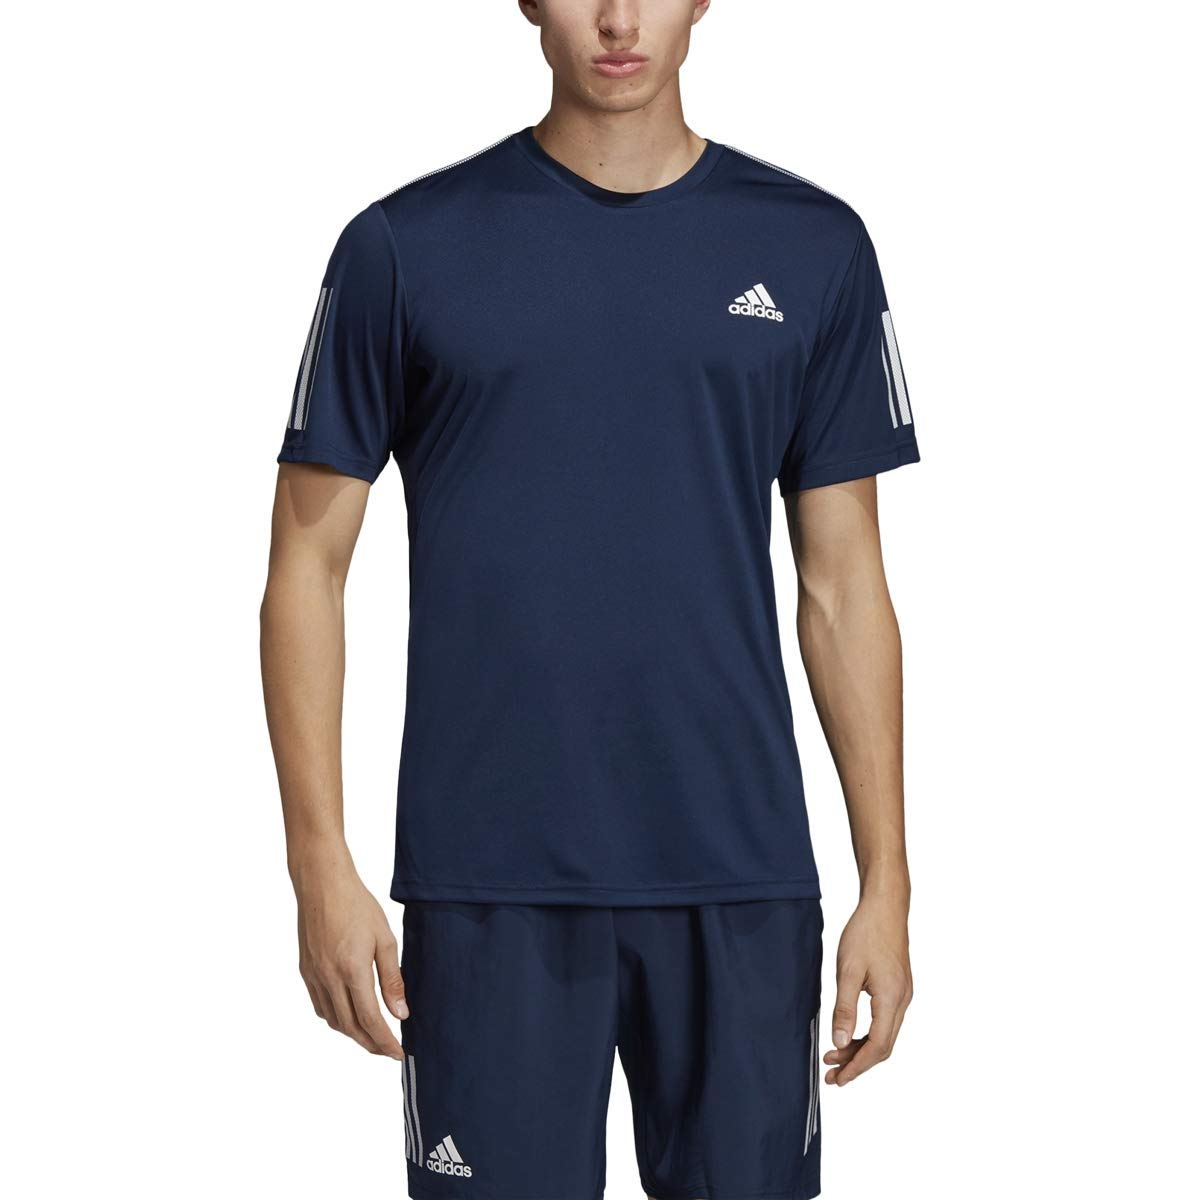 adidas Men's 3-Stripes Club Tennis Tee, Collegiate Navy/White, Small by adidas (Image #1)